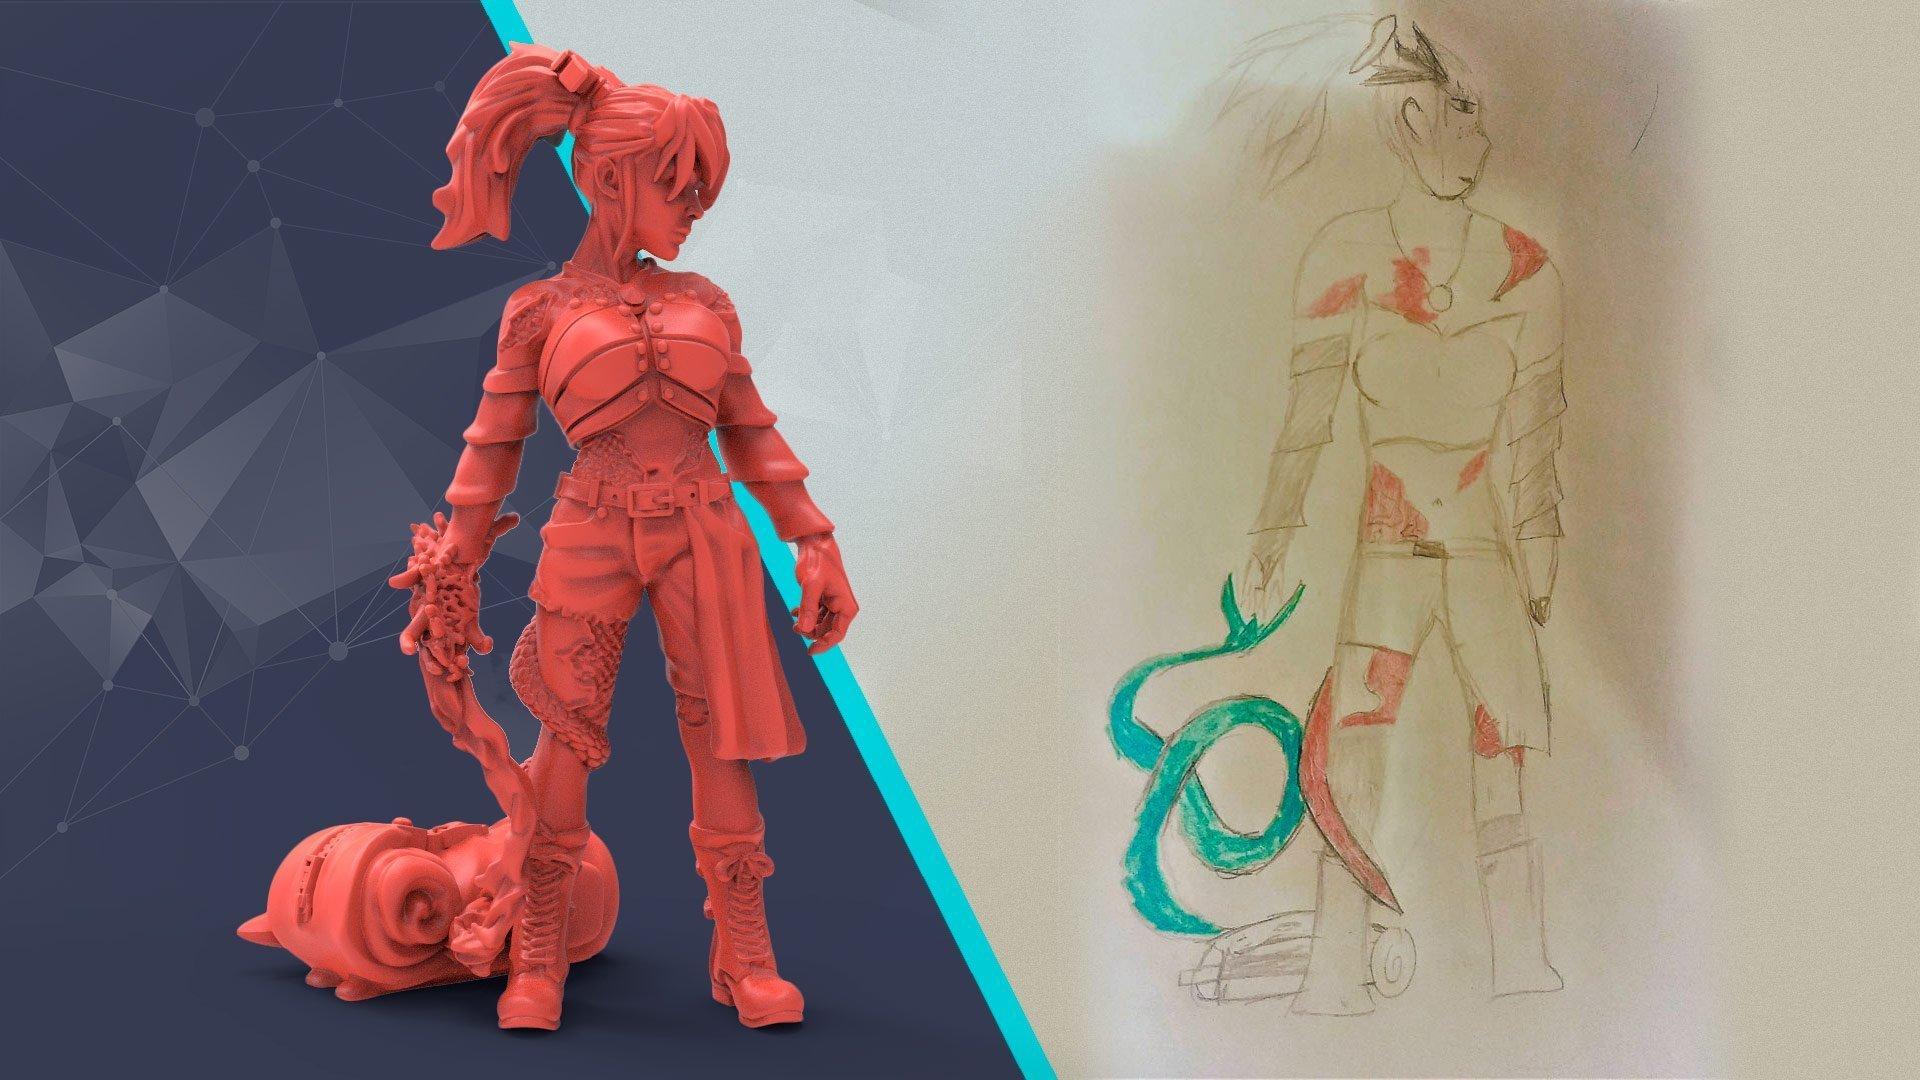 custom 3d modelling from sketch